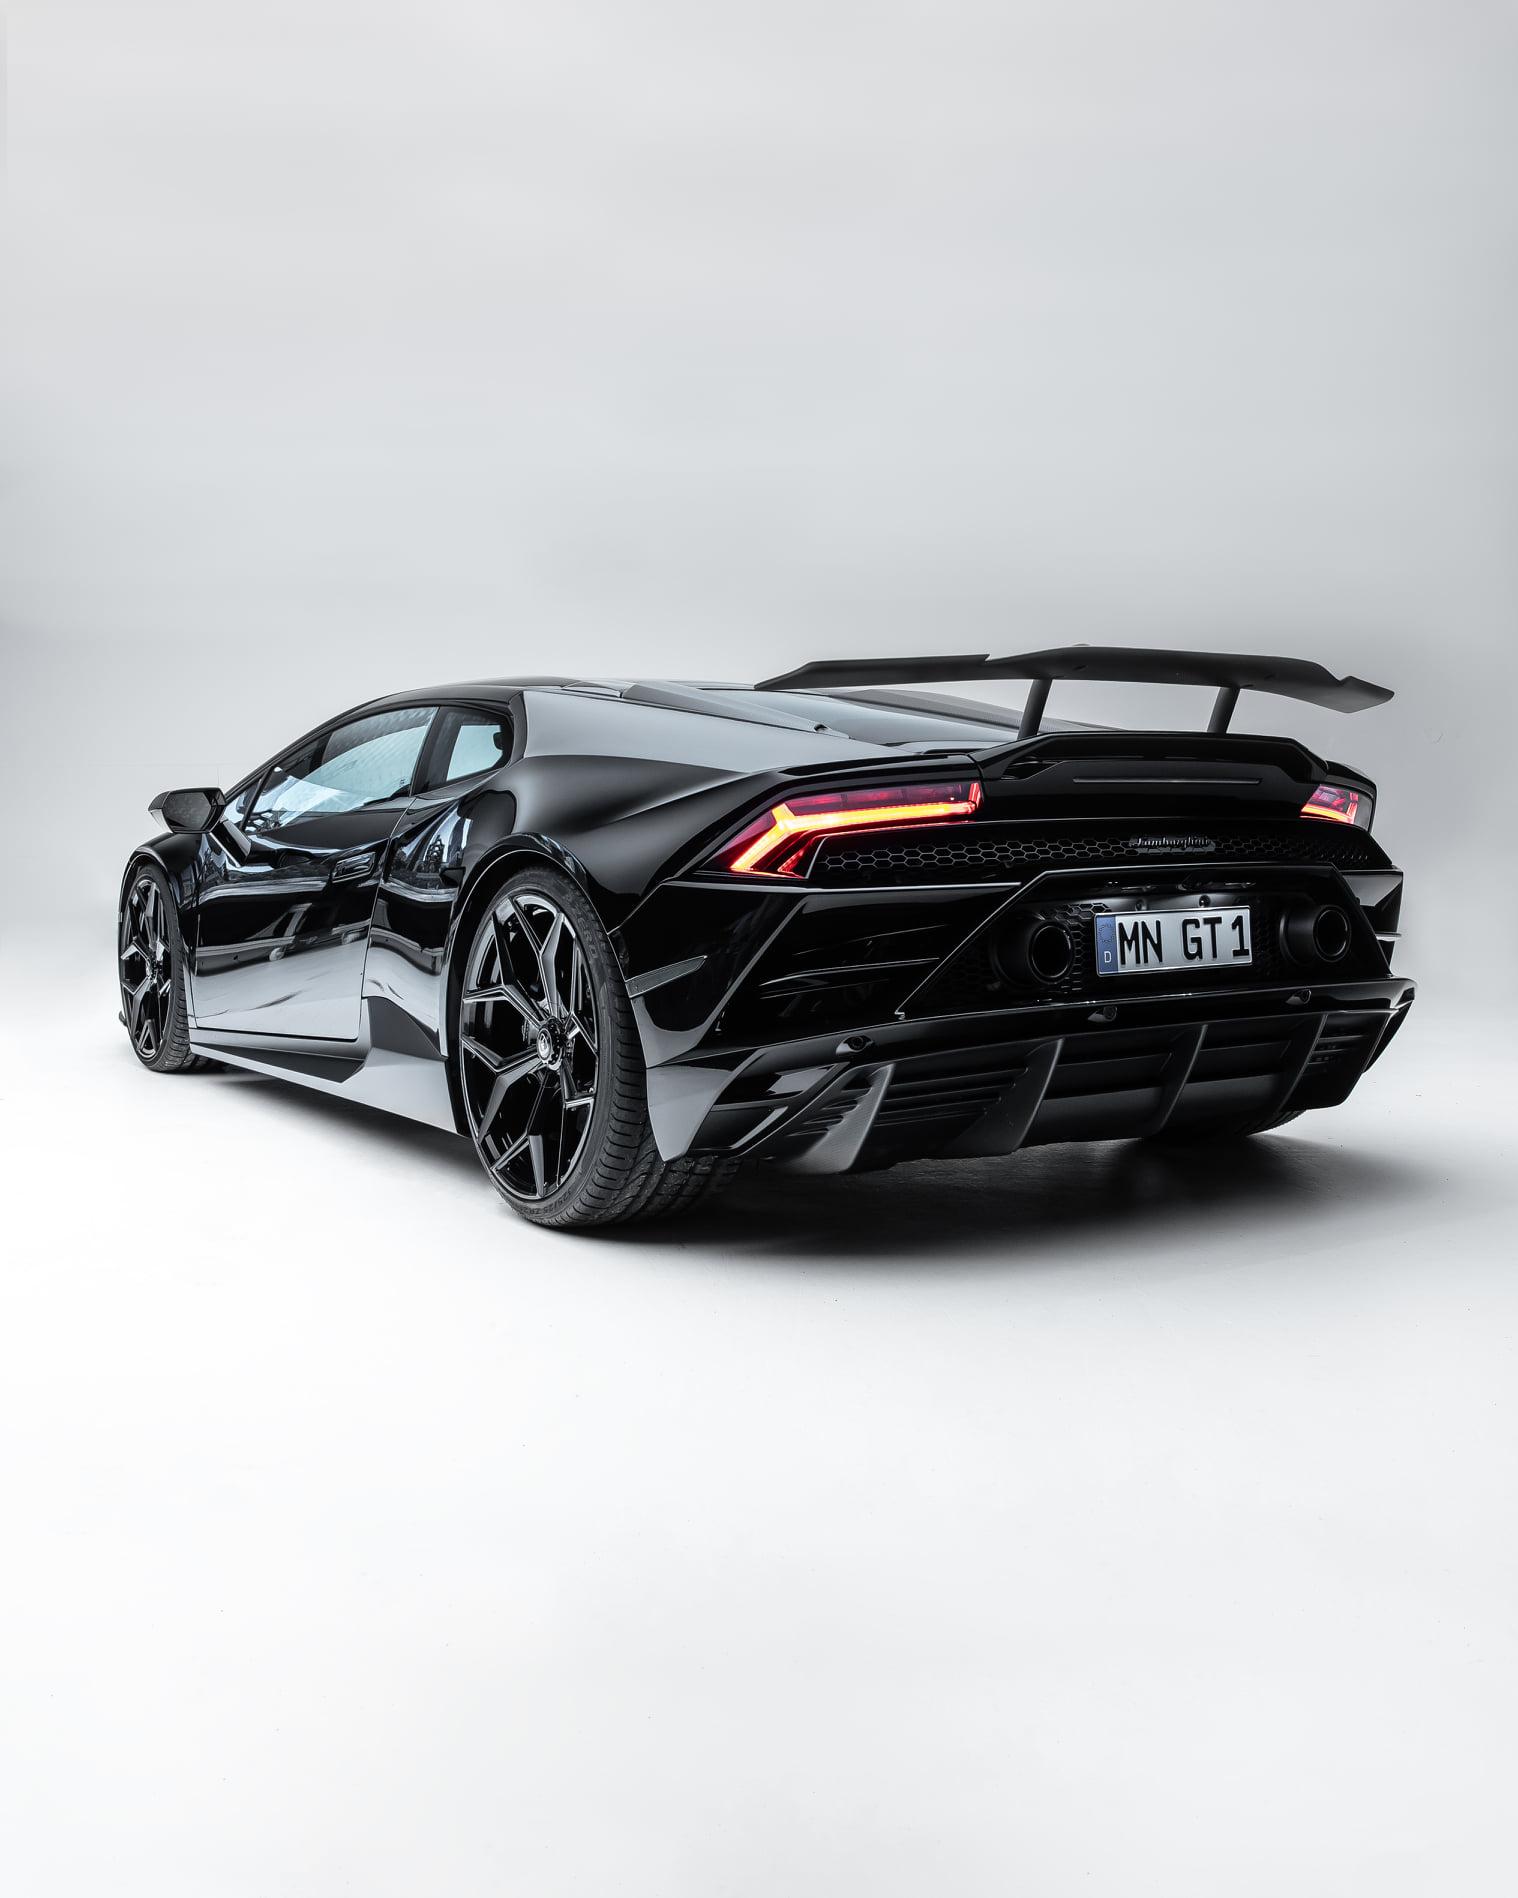 Lamborghini-Huracan-Evo-RWD-by-Novitec-12